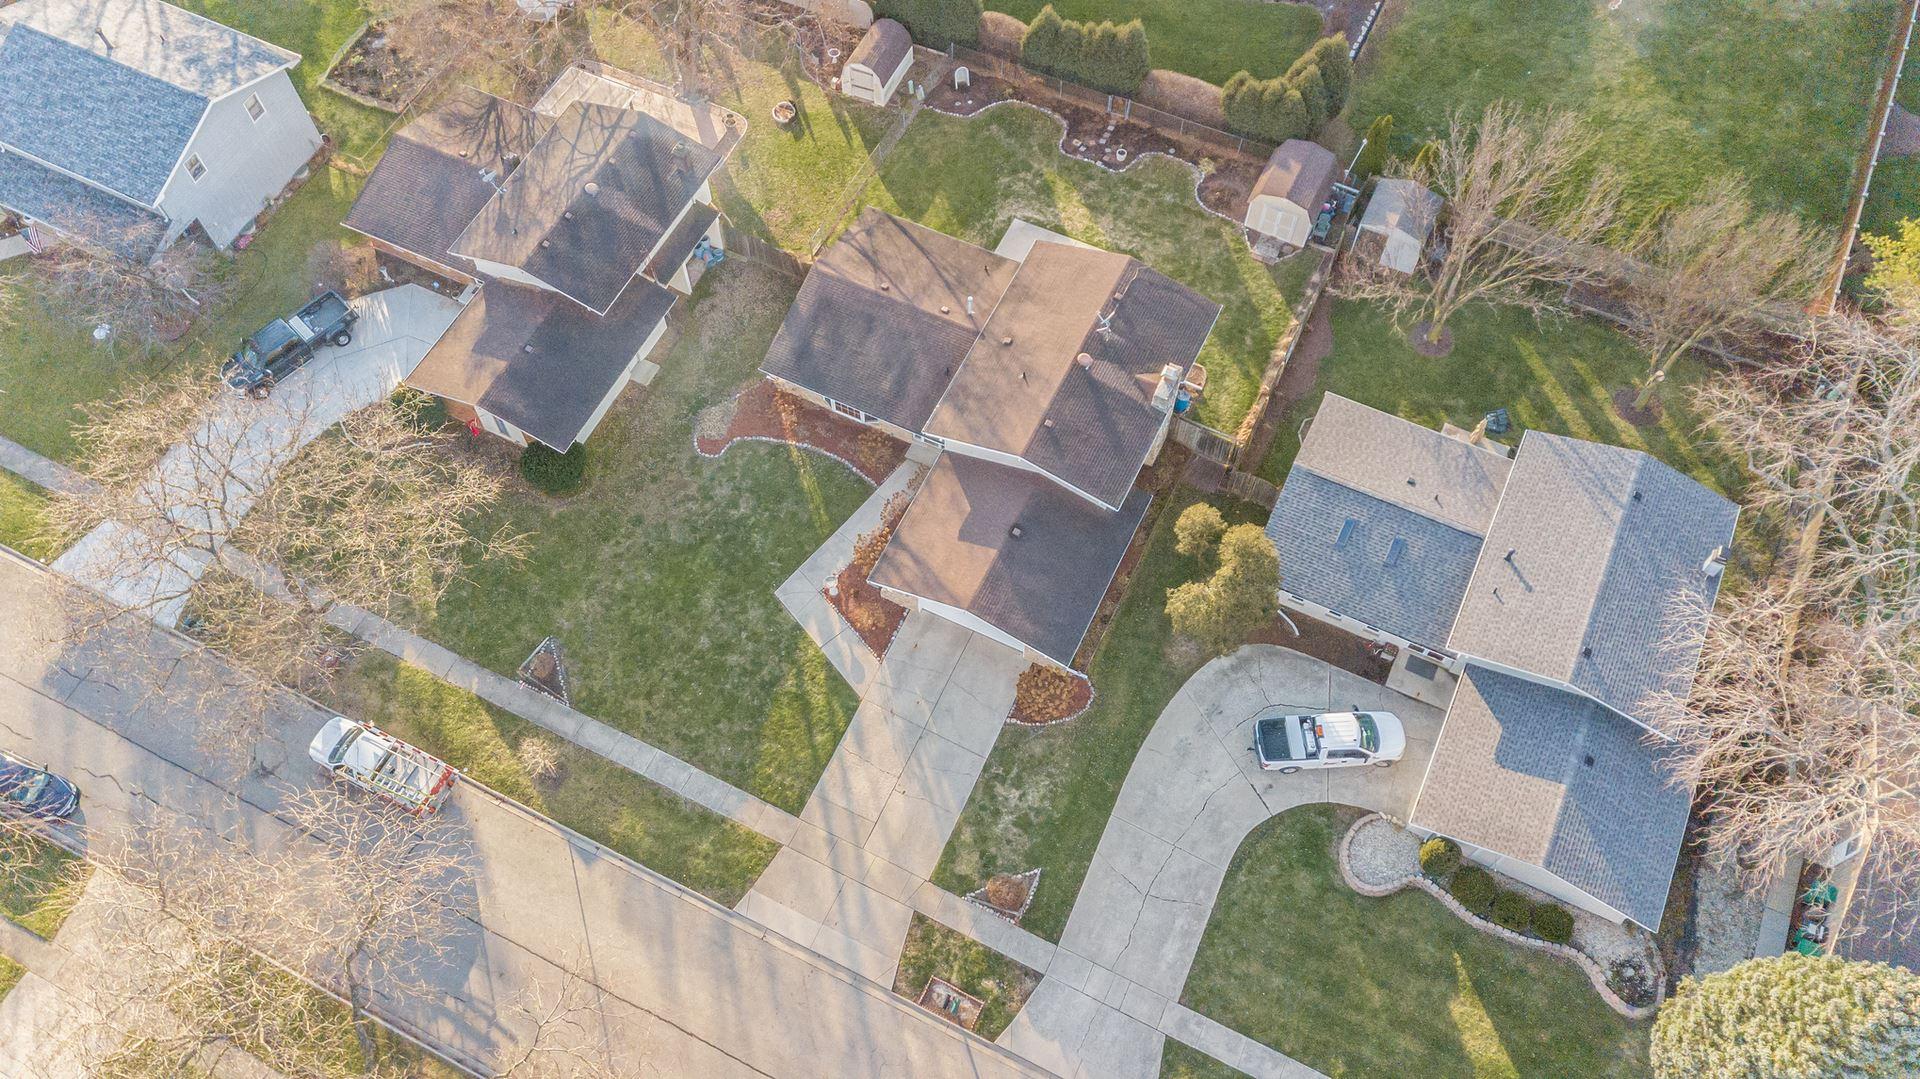 Photo of 523 Ca Crest Drive, Shorewood, IL 60404 (MLS # 10948962)